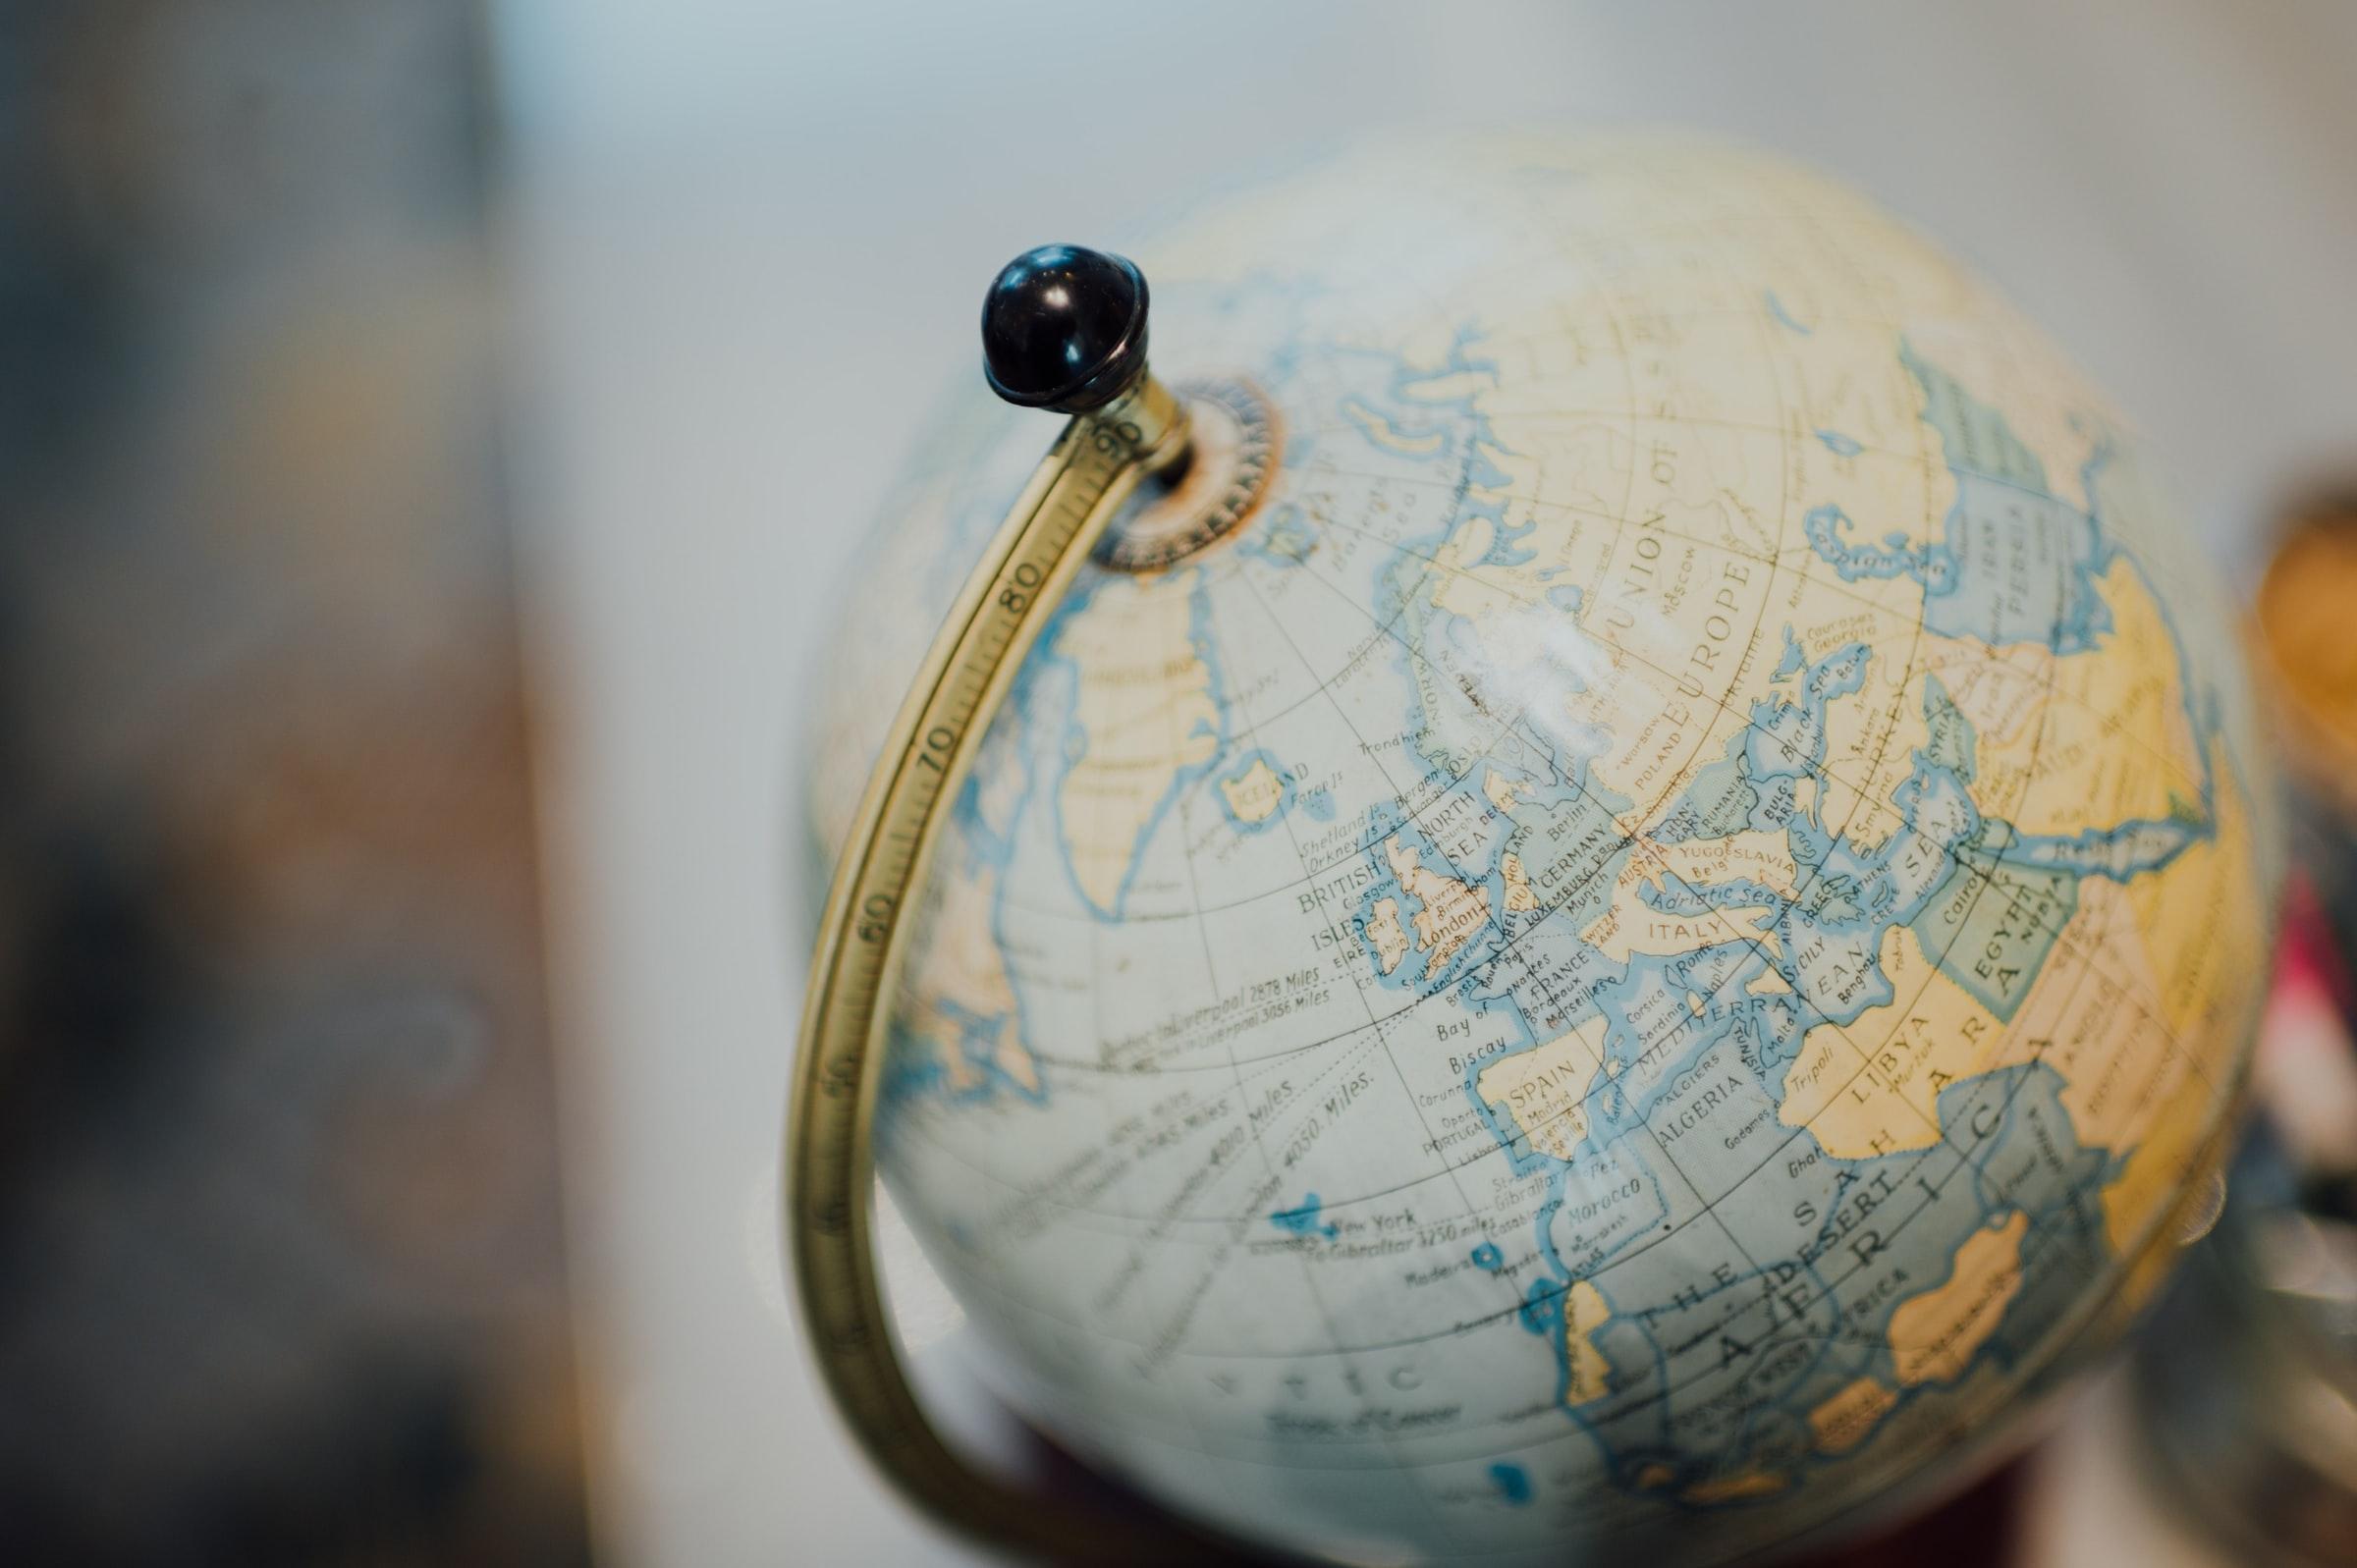 InsightOut: Basil's Grand Tour